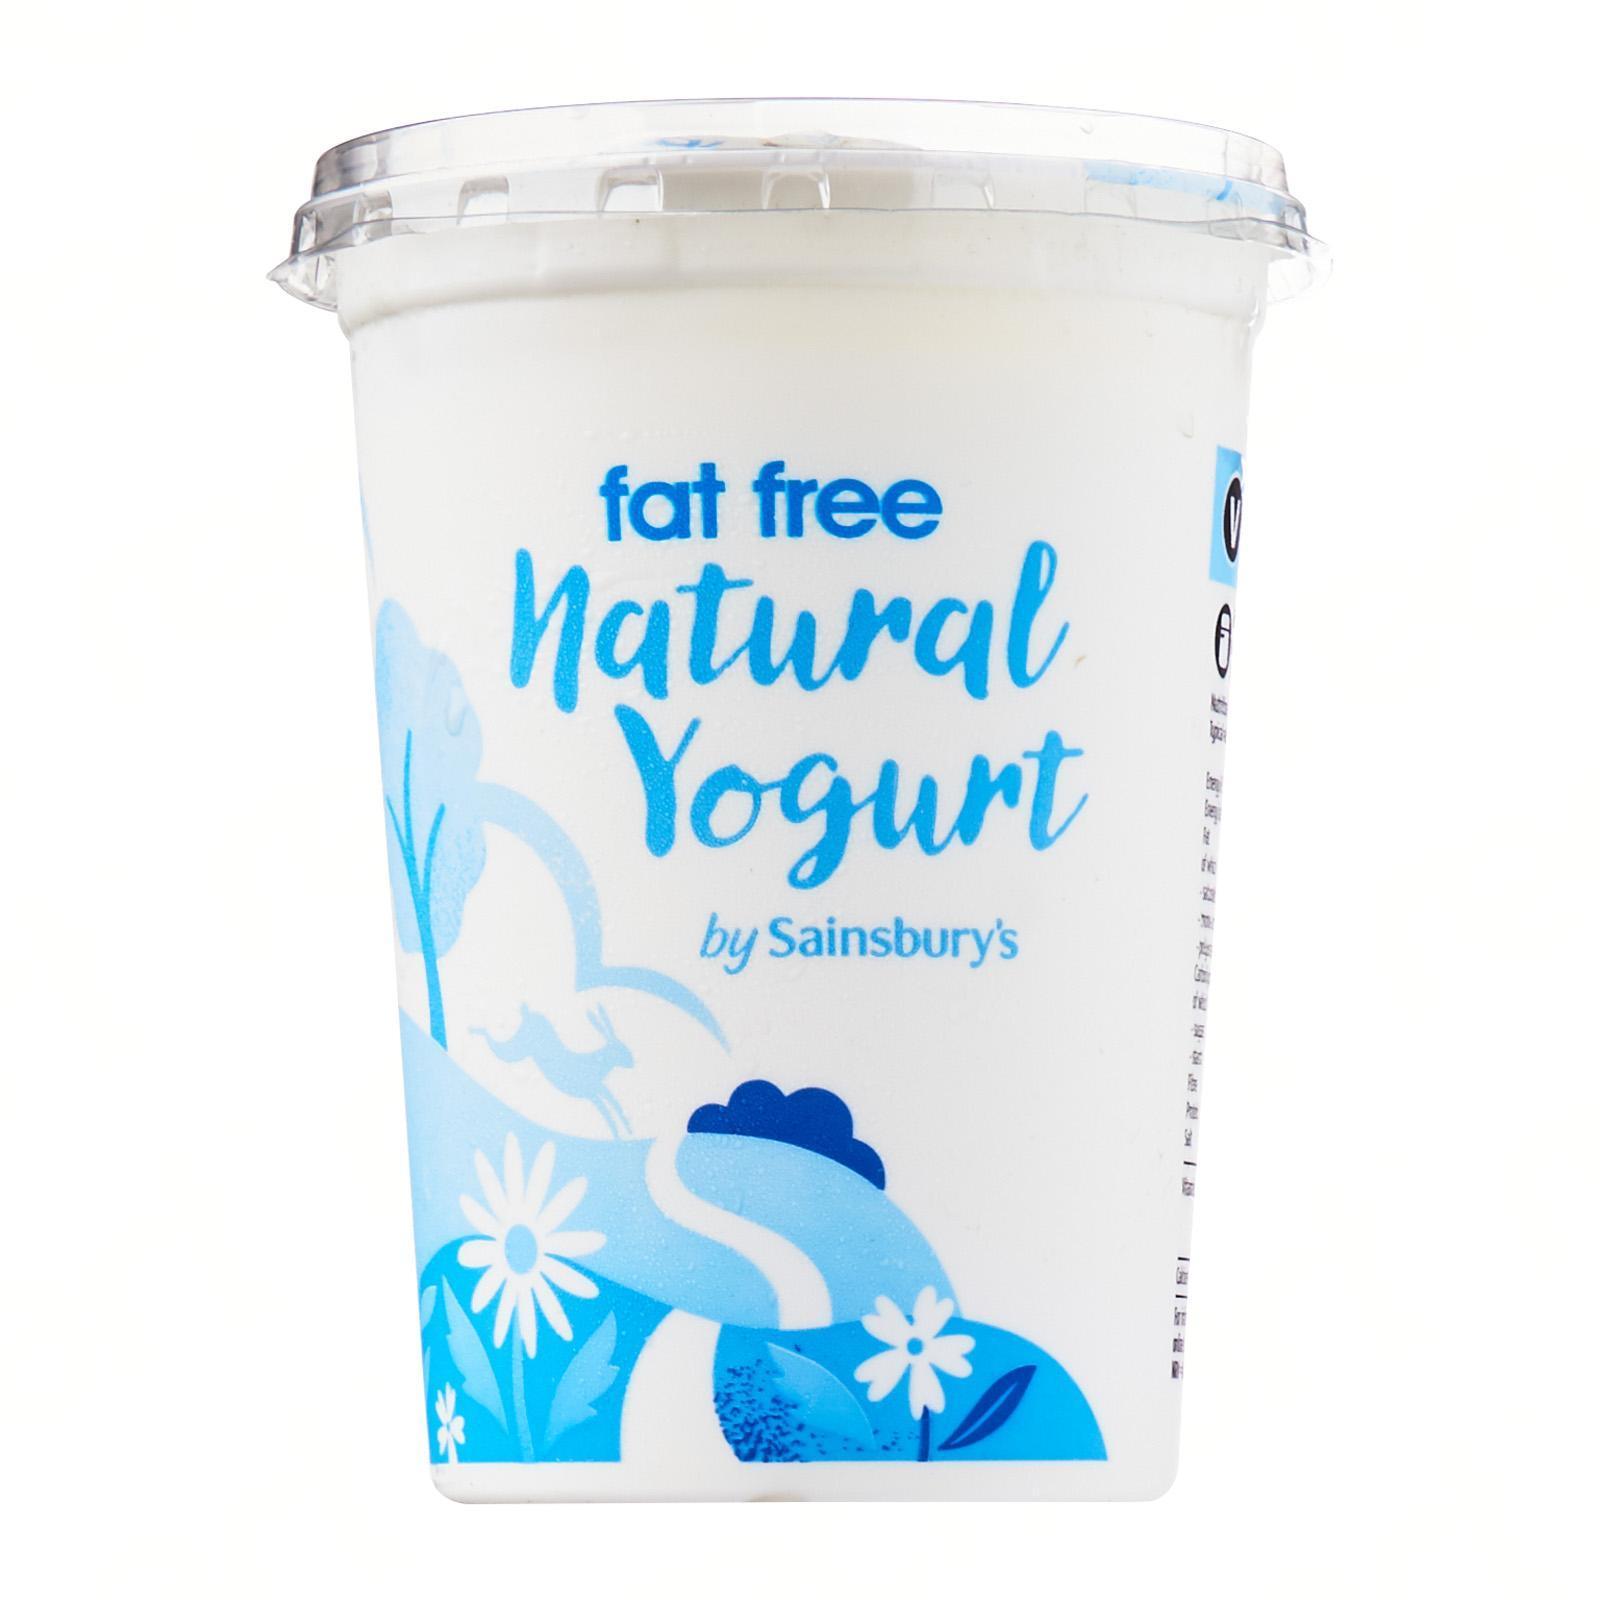 Sainsbury's Fat Free Natural Yoghurt